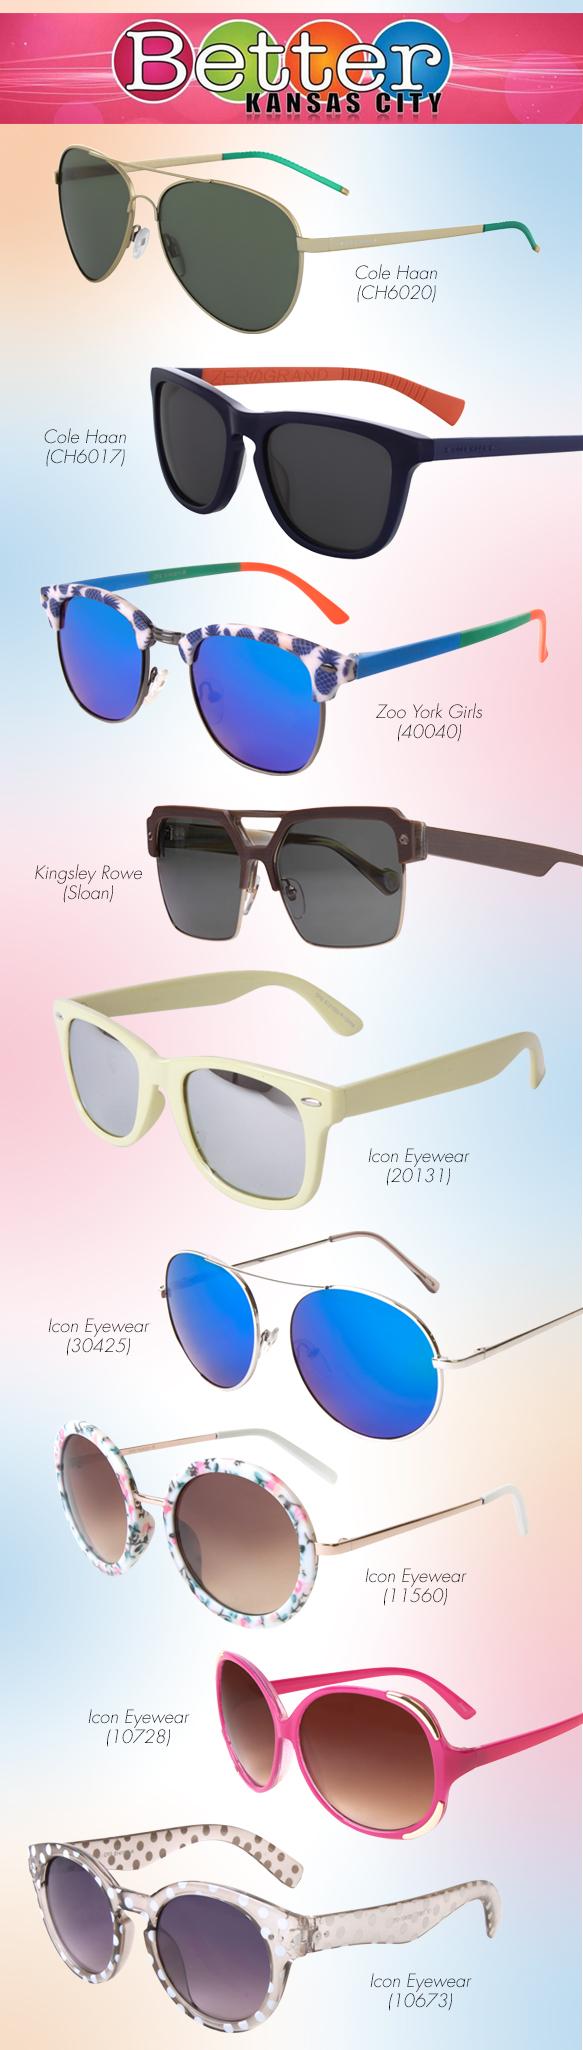 Cole Haan (CH6017), Cole Haan (CH6020), Icon Eyewear (10673), Icon Eyewear (10728), Icon Eyewear (11560), Icon Eyewear (20131), Icon Eyewear (30425), Kingsley Rowe (Sloan), Zoo York Girls (40040)